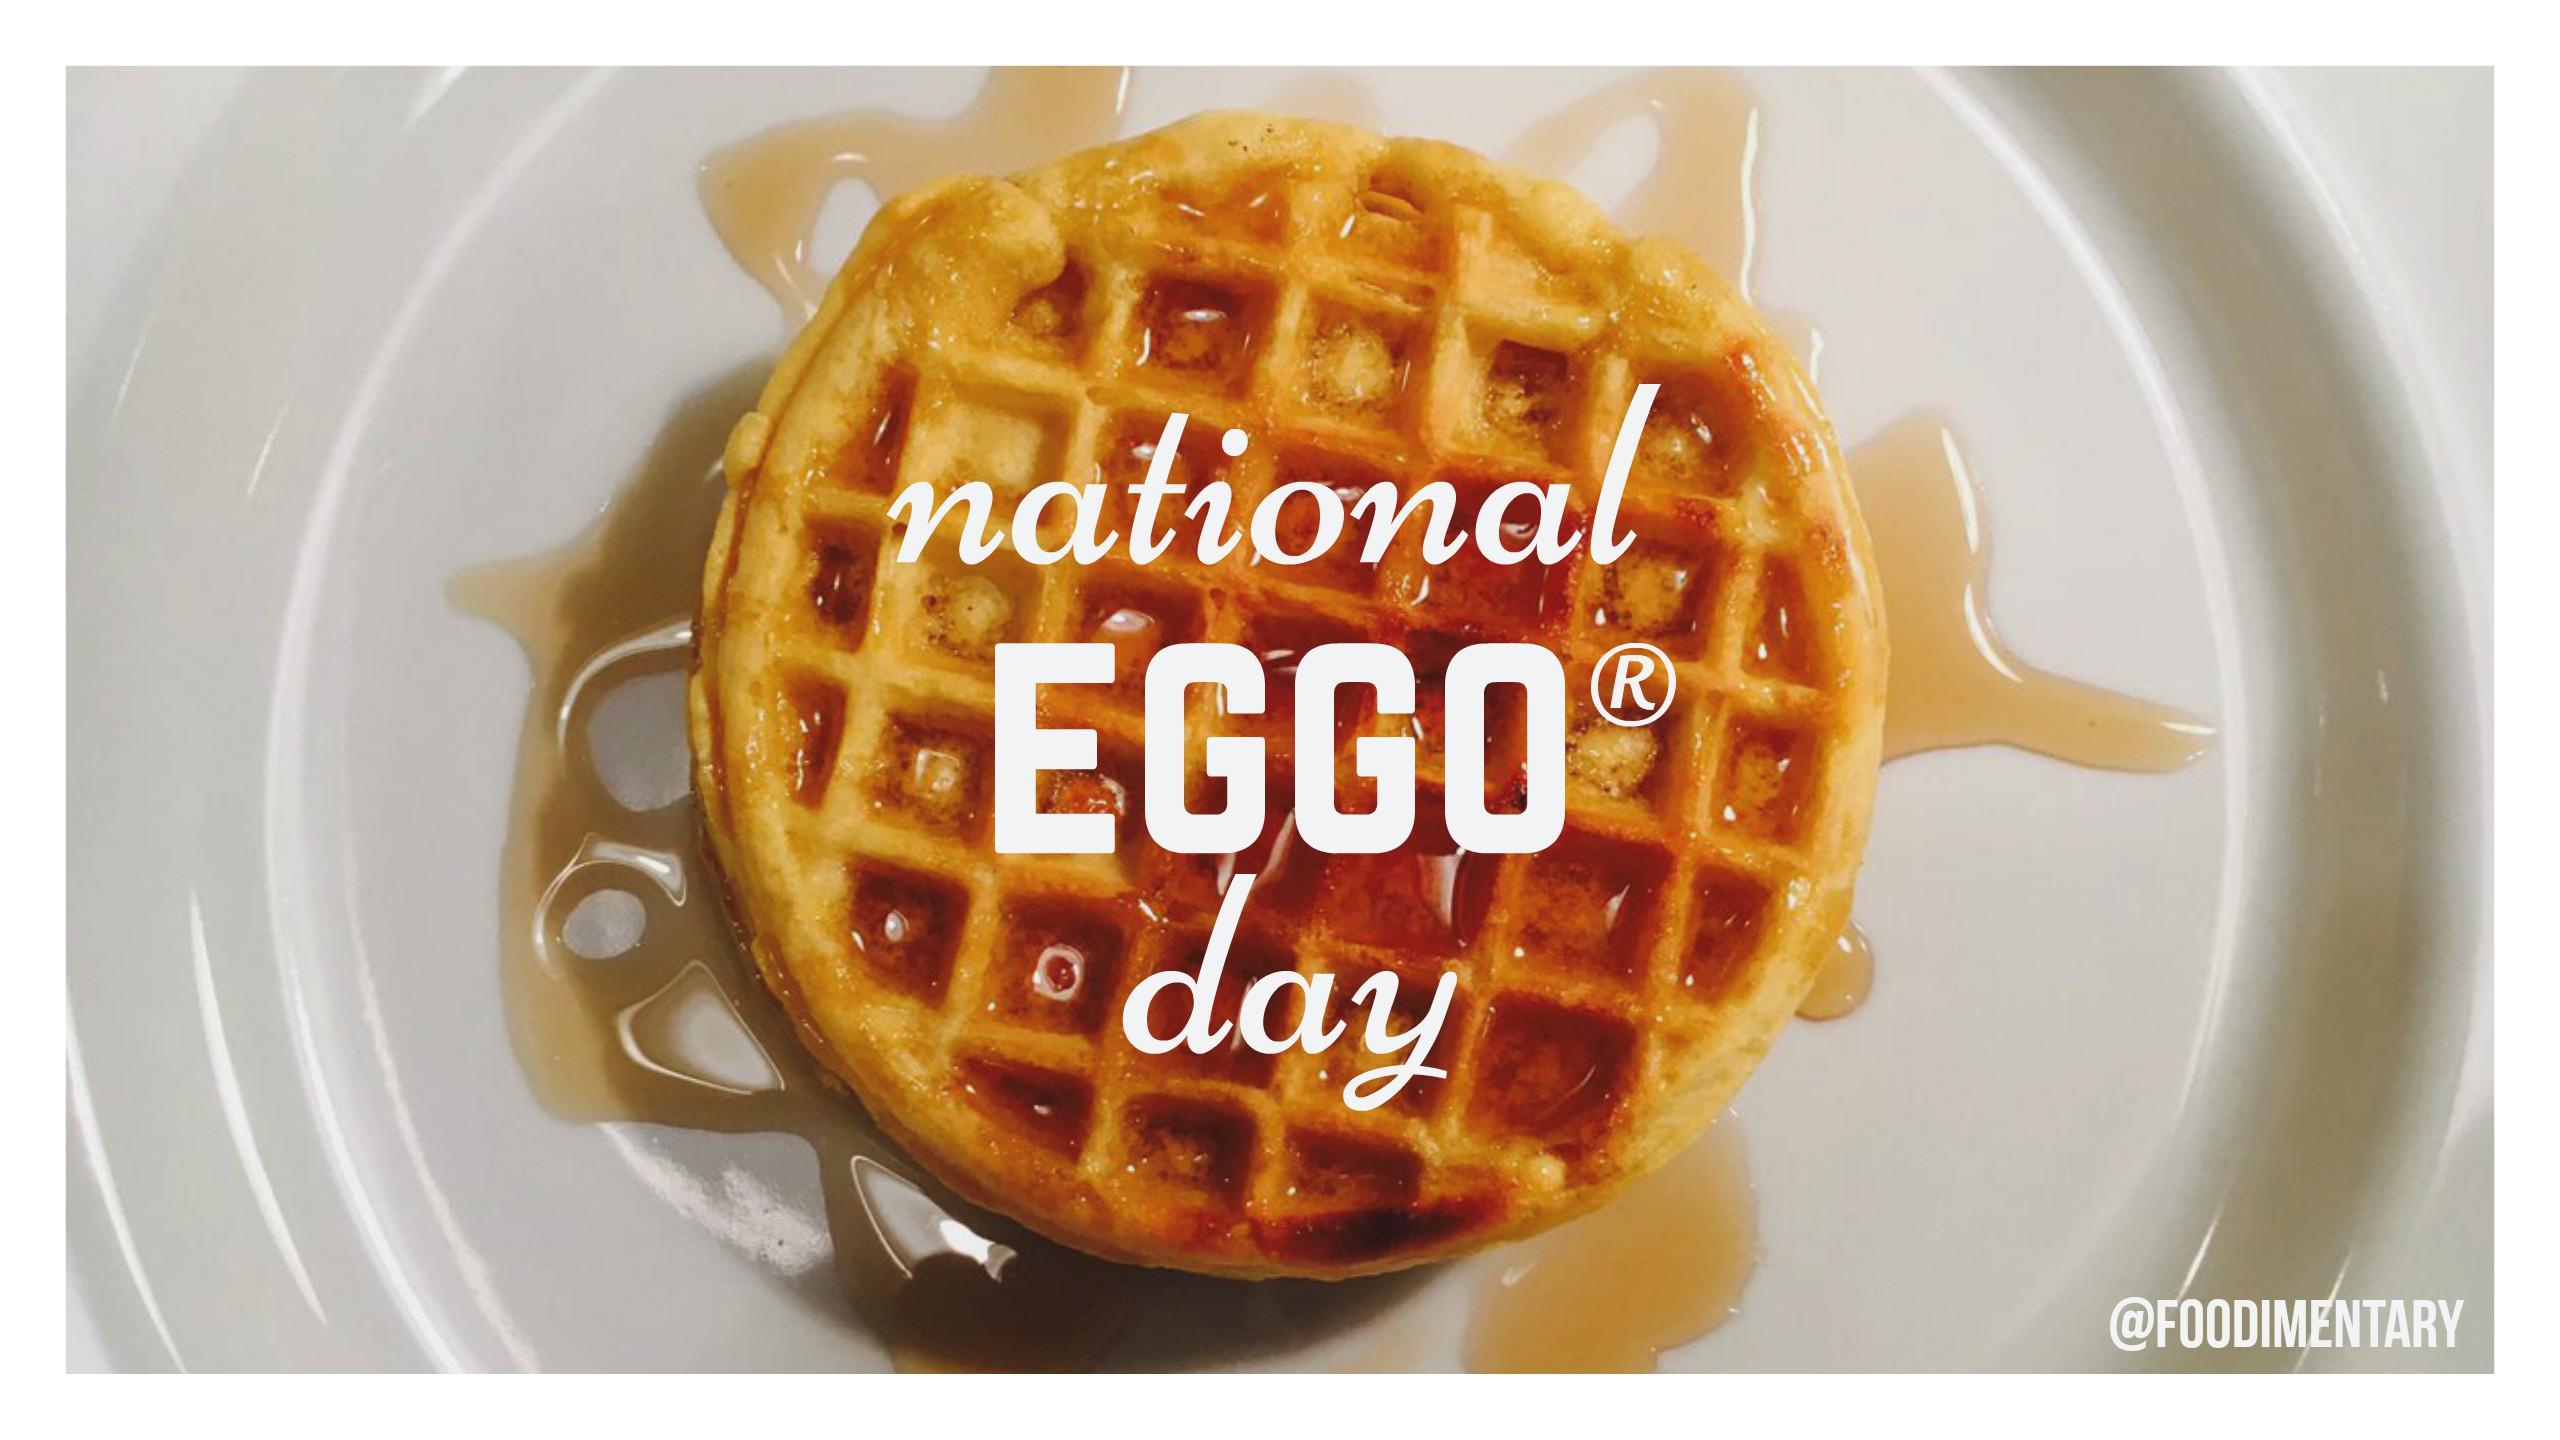 Eggo Cuisine | October 20th Is National Eggo Day Foodimentary National Food